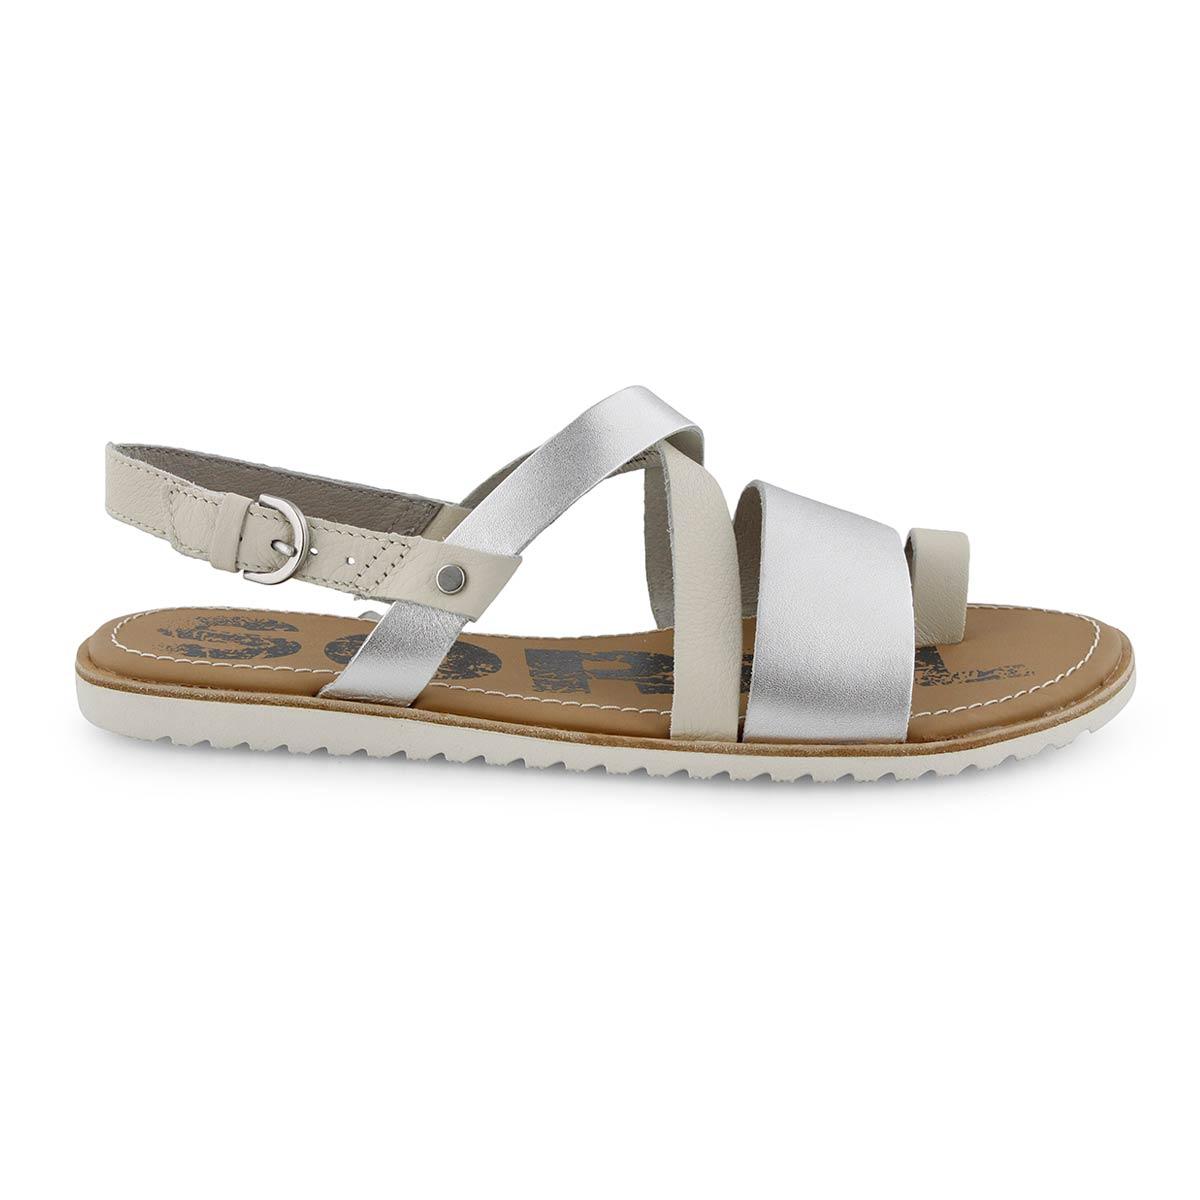 Lds Ella Criss Cross slvr casual sandal